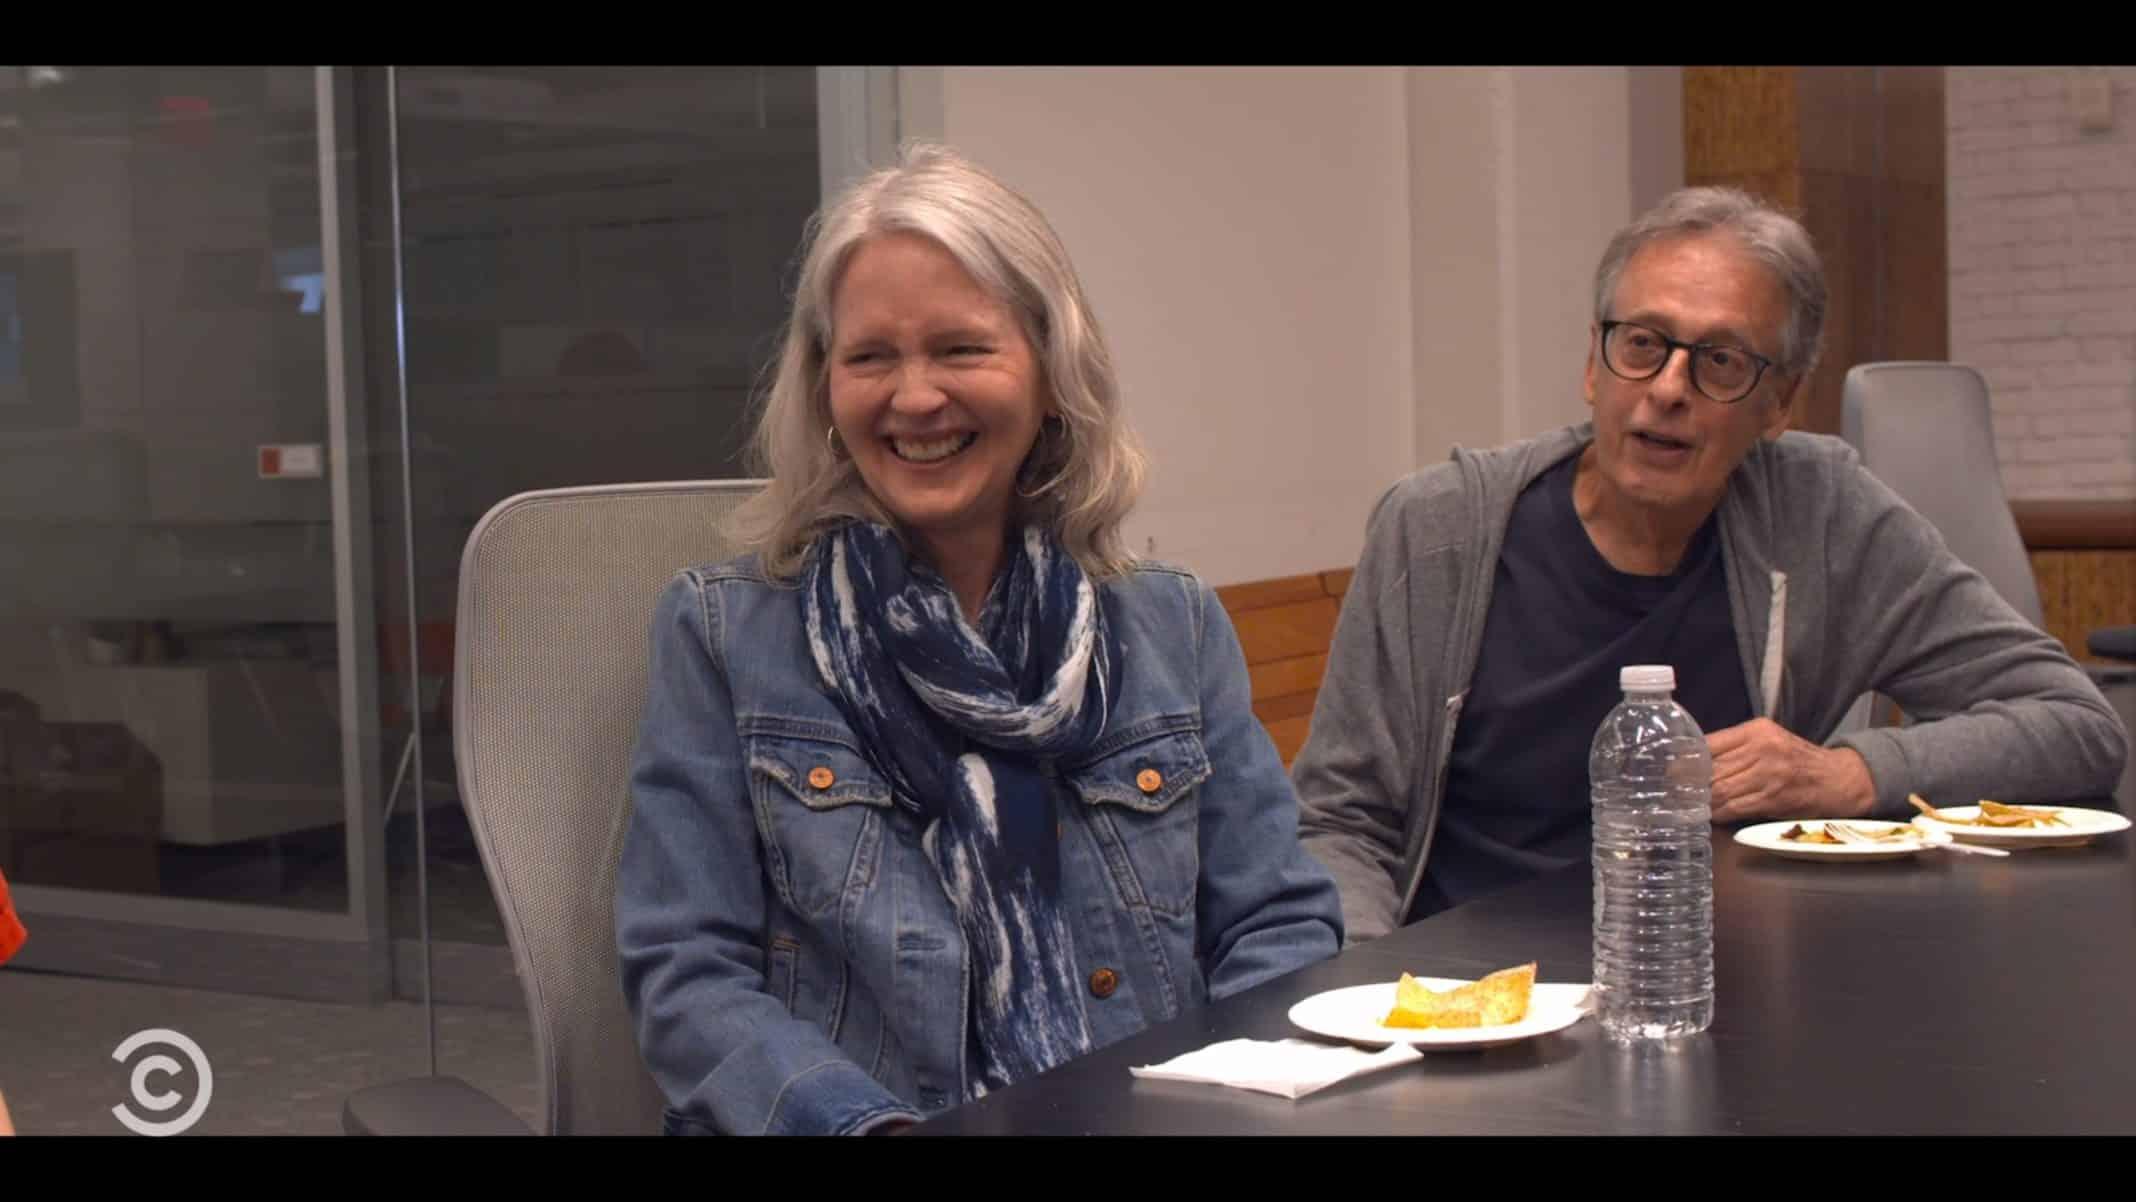 Mary and Morrie Povitsky making jokes.